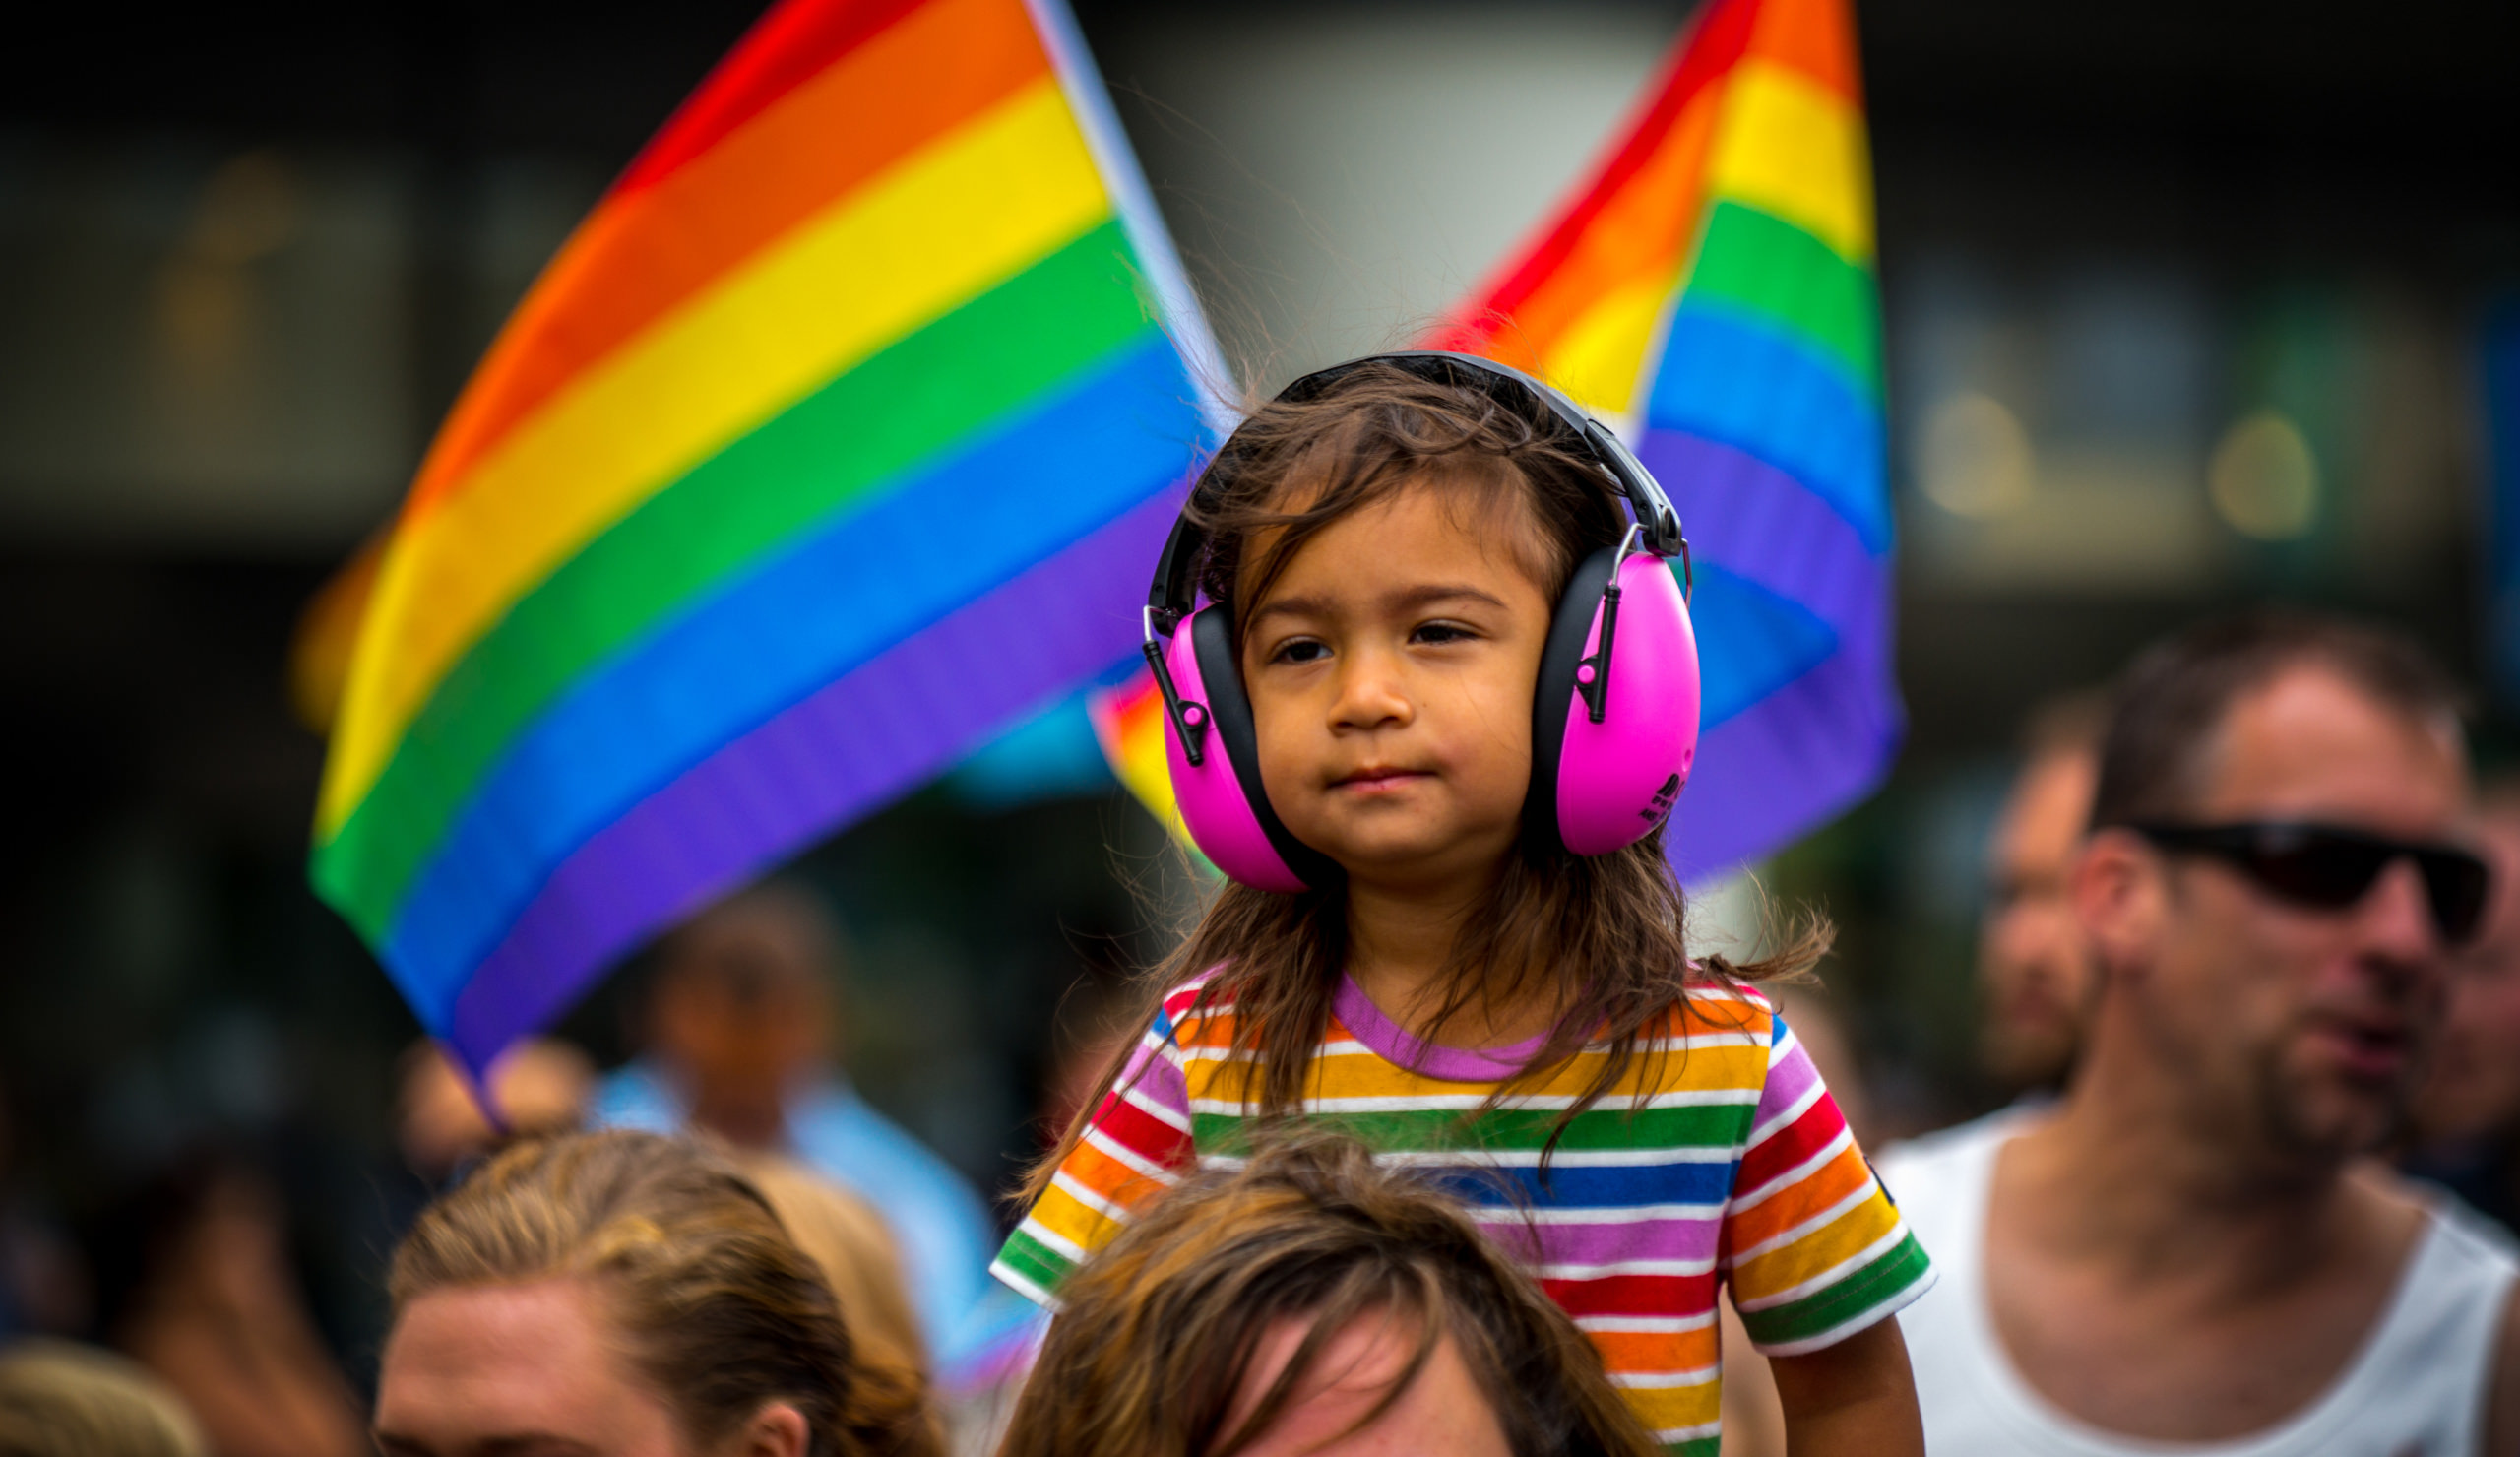 Pride in Malmö, Sweden